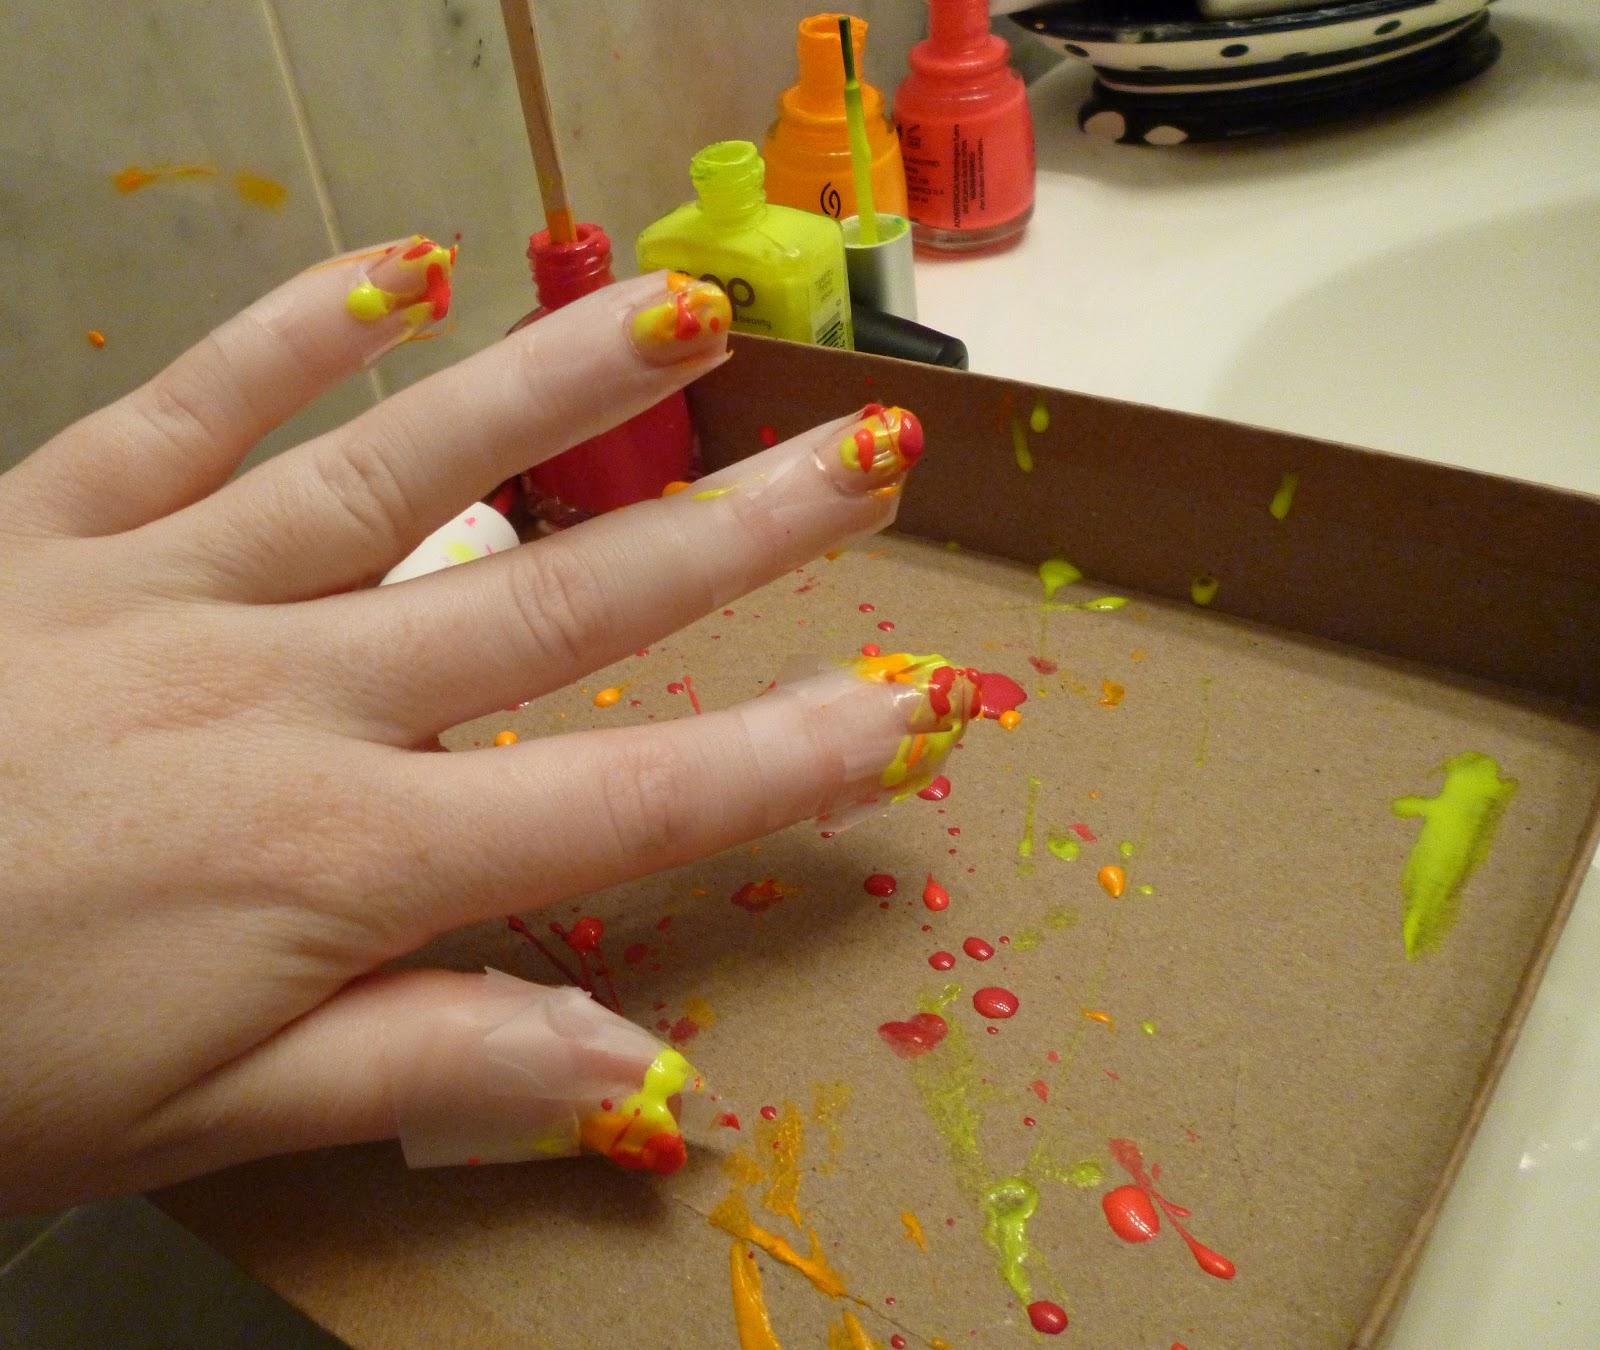 Nail polish designs with tape Diy nail art ideas step by step